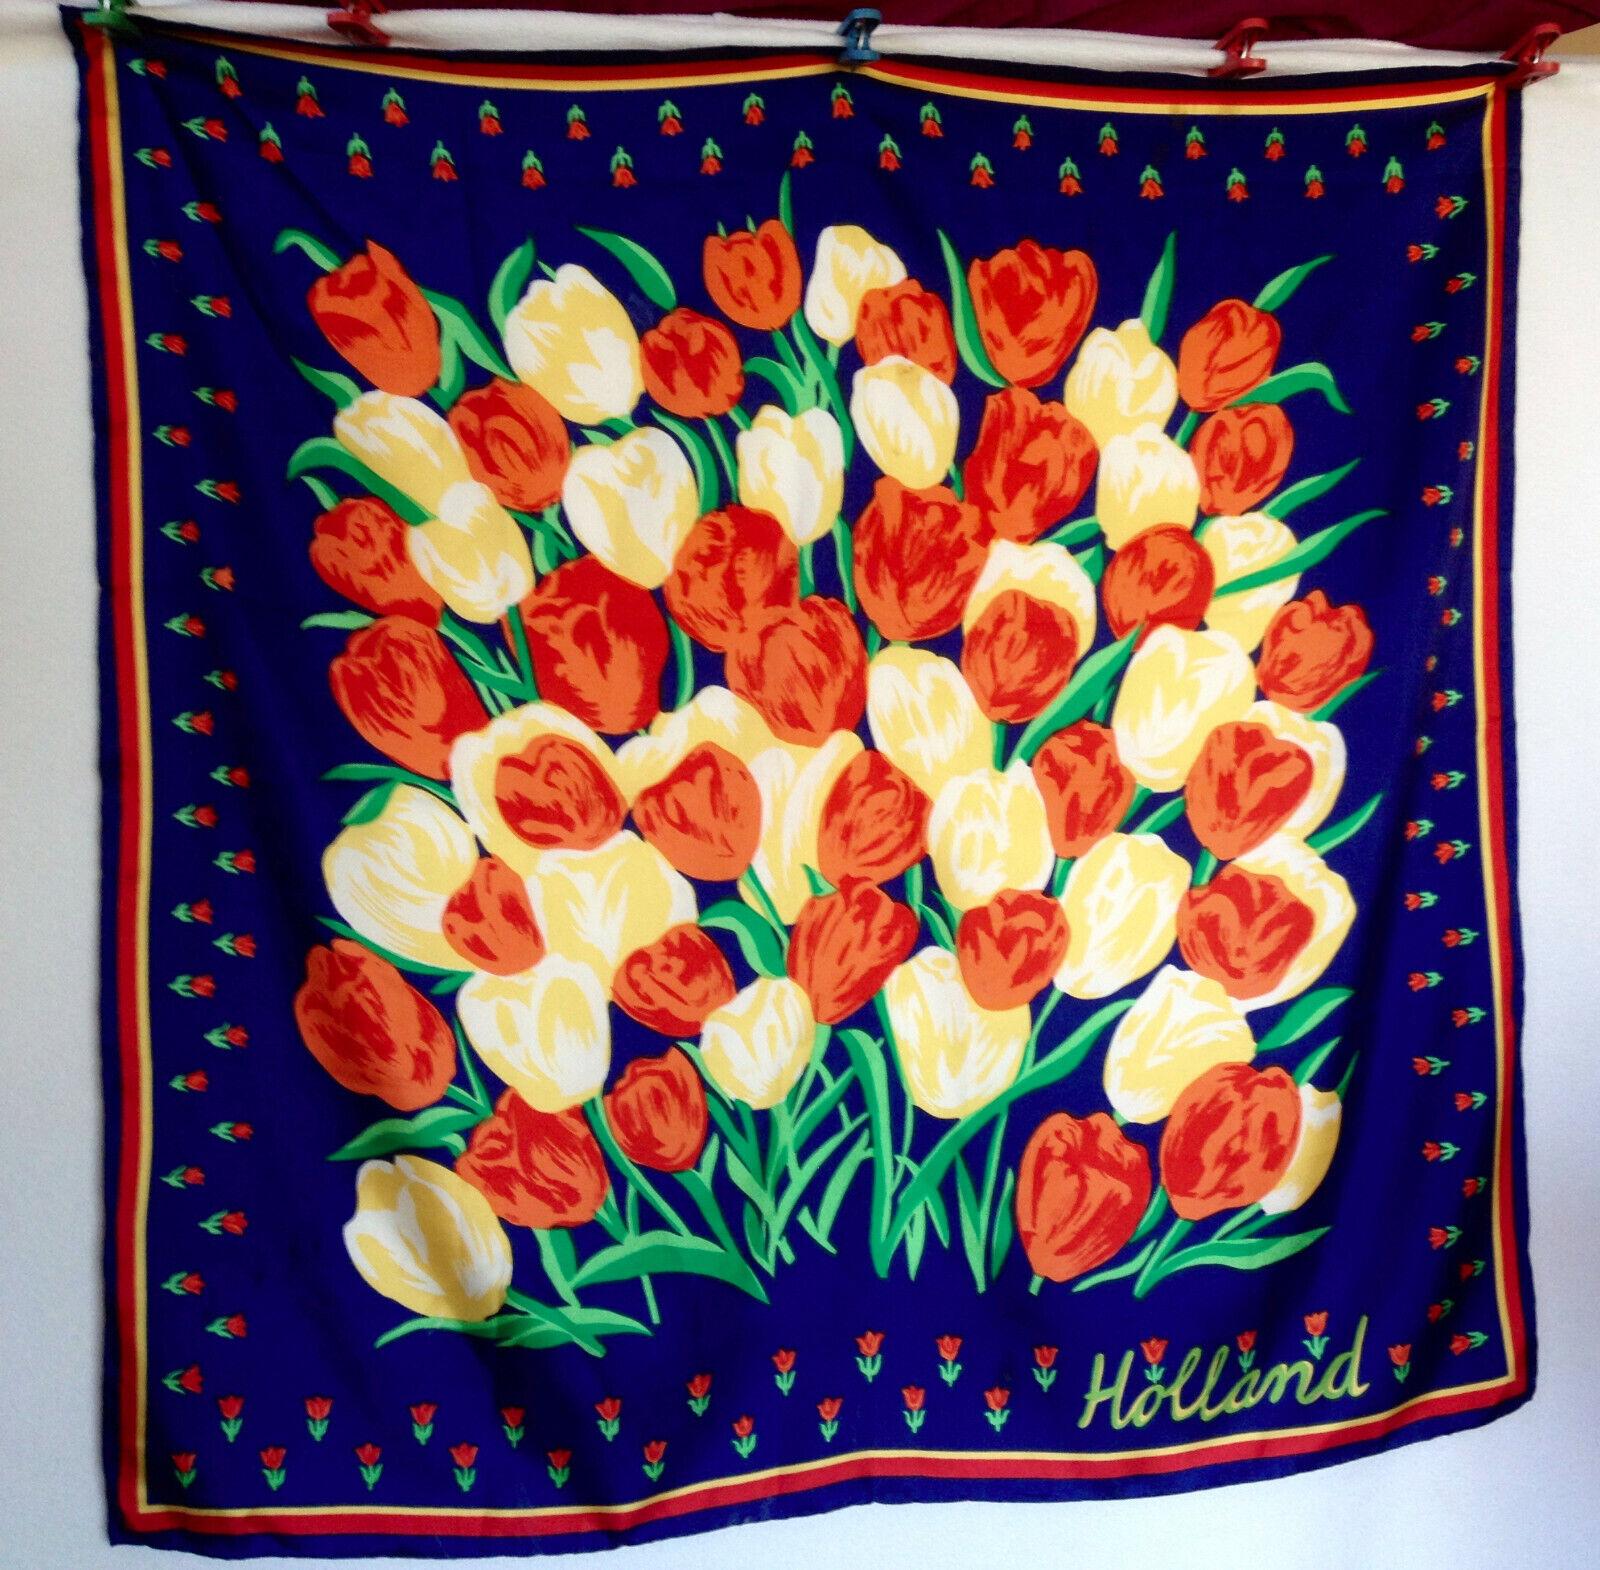 Holland Tulip Print Women's Scarf - image 1